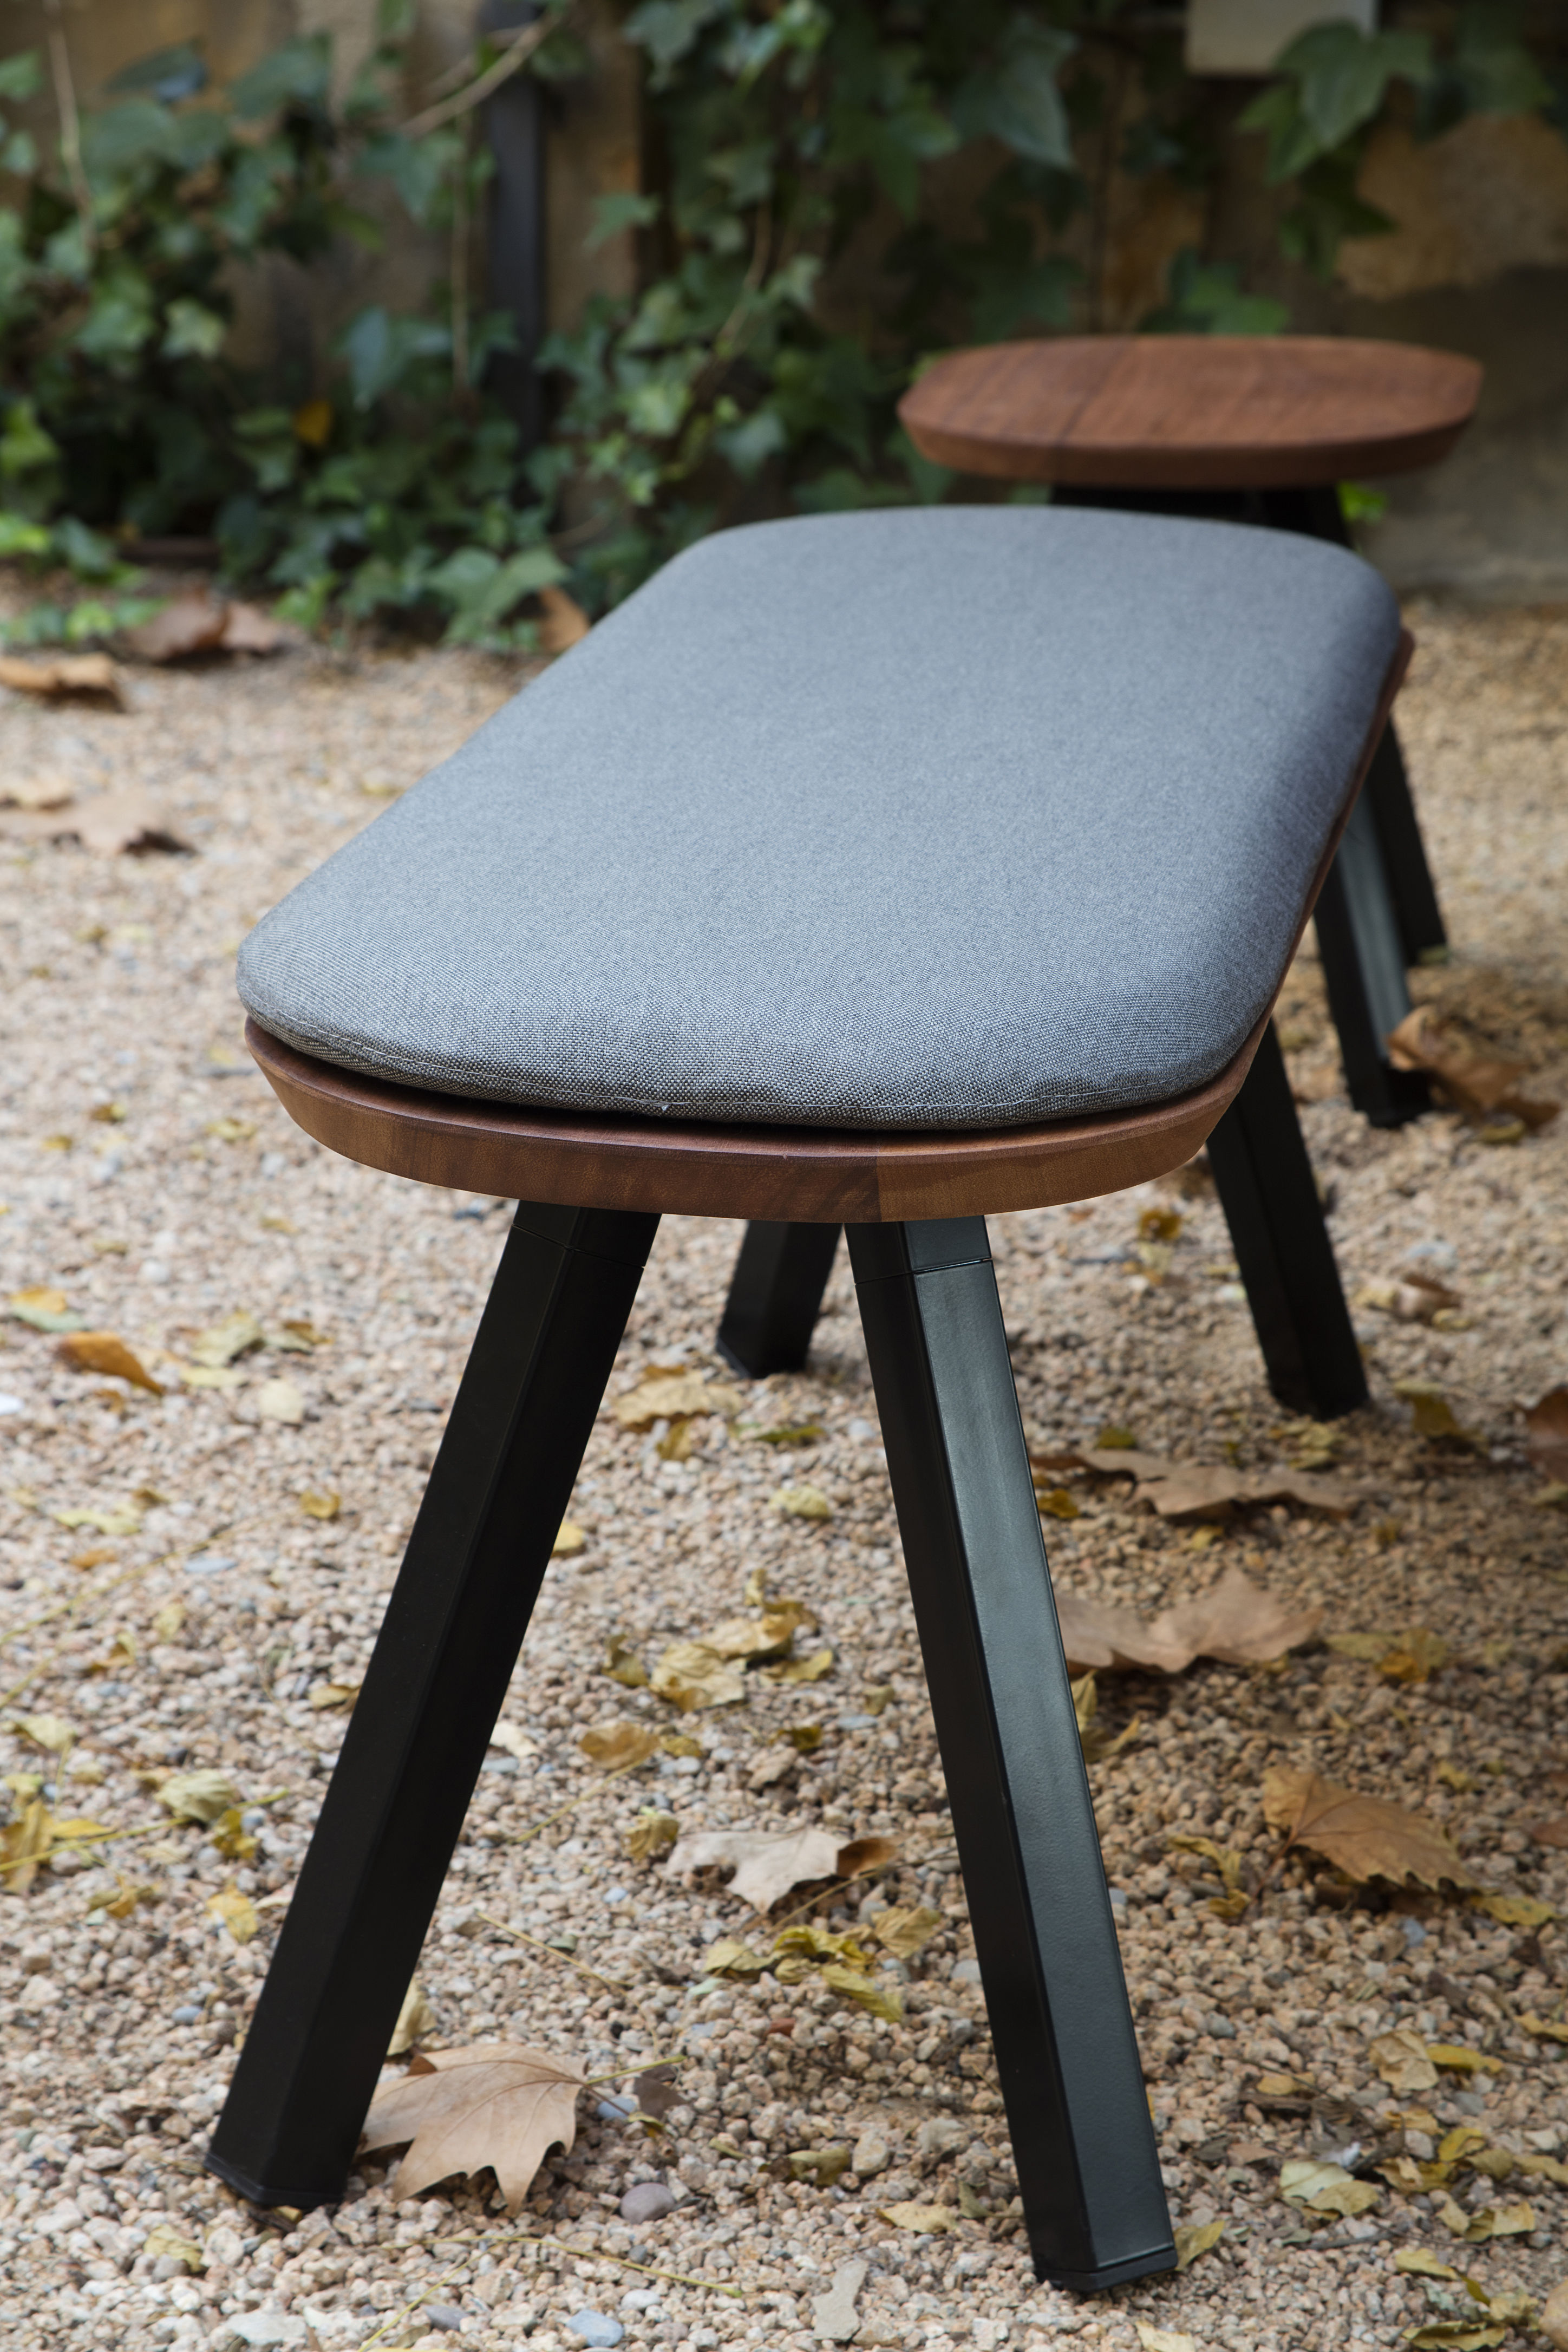 banc y m bois m tal l 220 cm bois naturel pieds. Black Bedroom Furniture Sets. Home Design Ideas